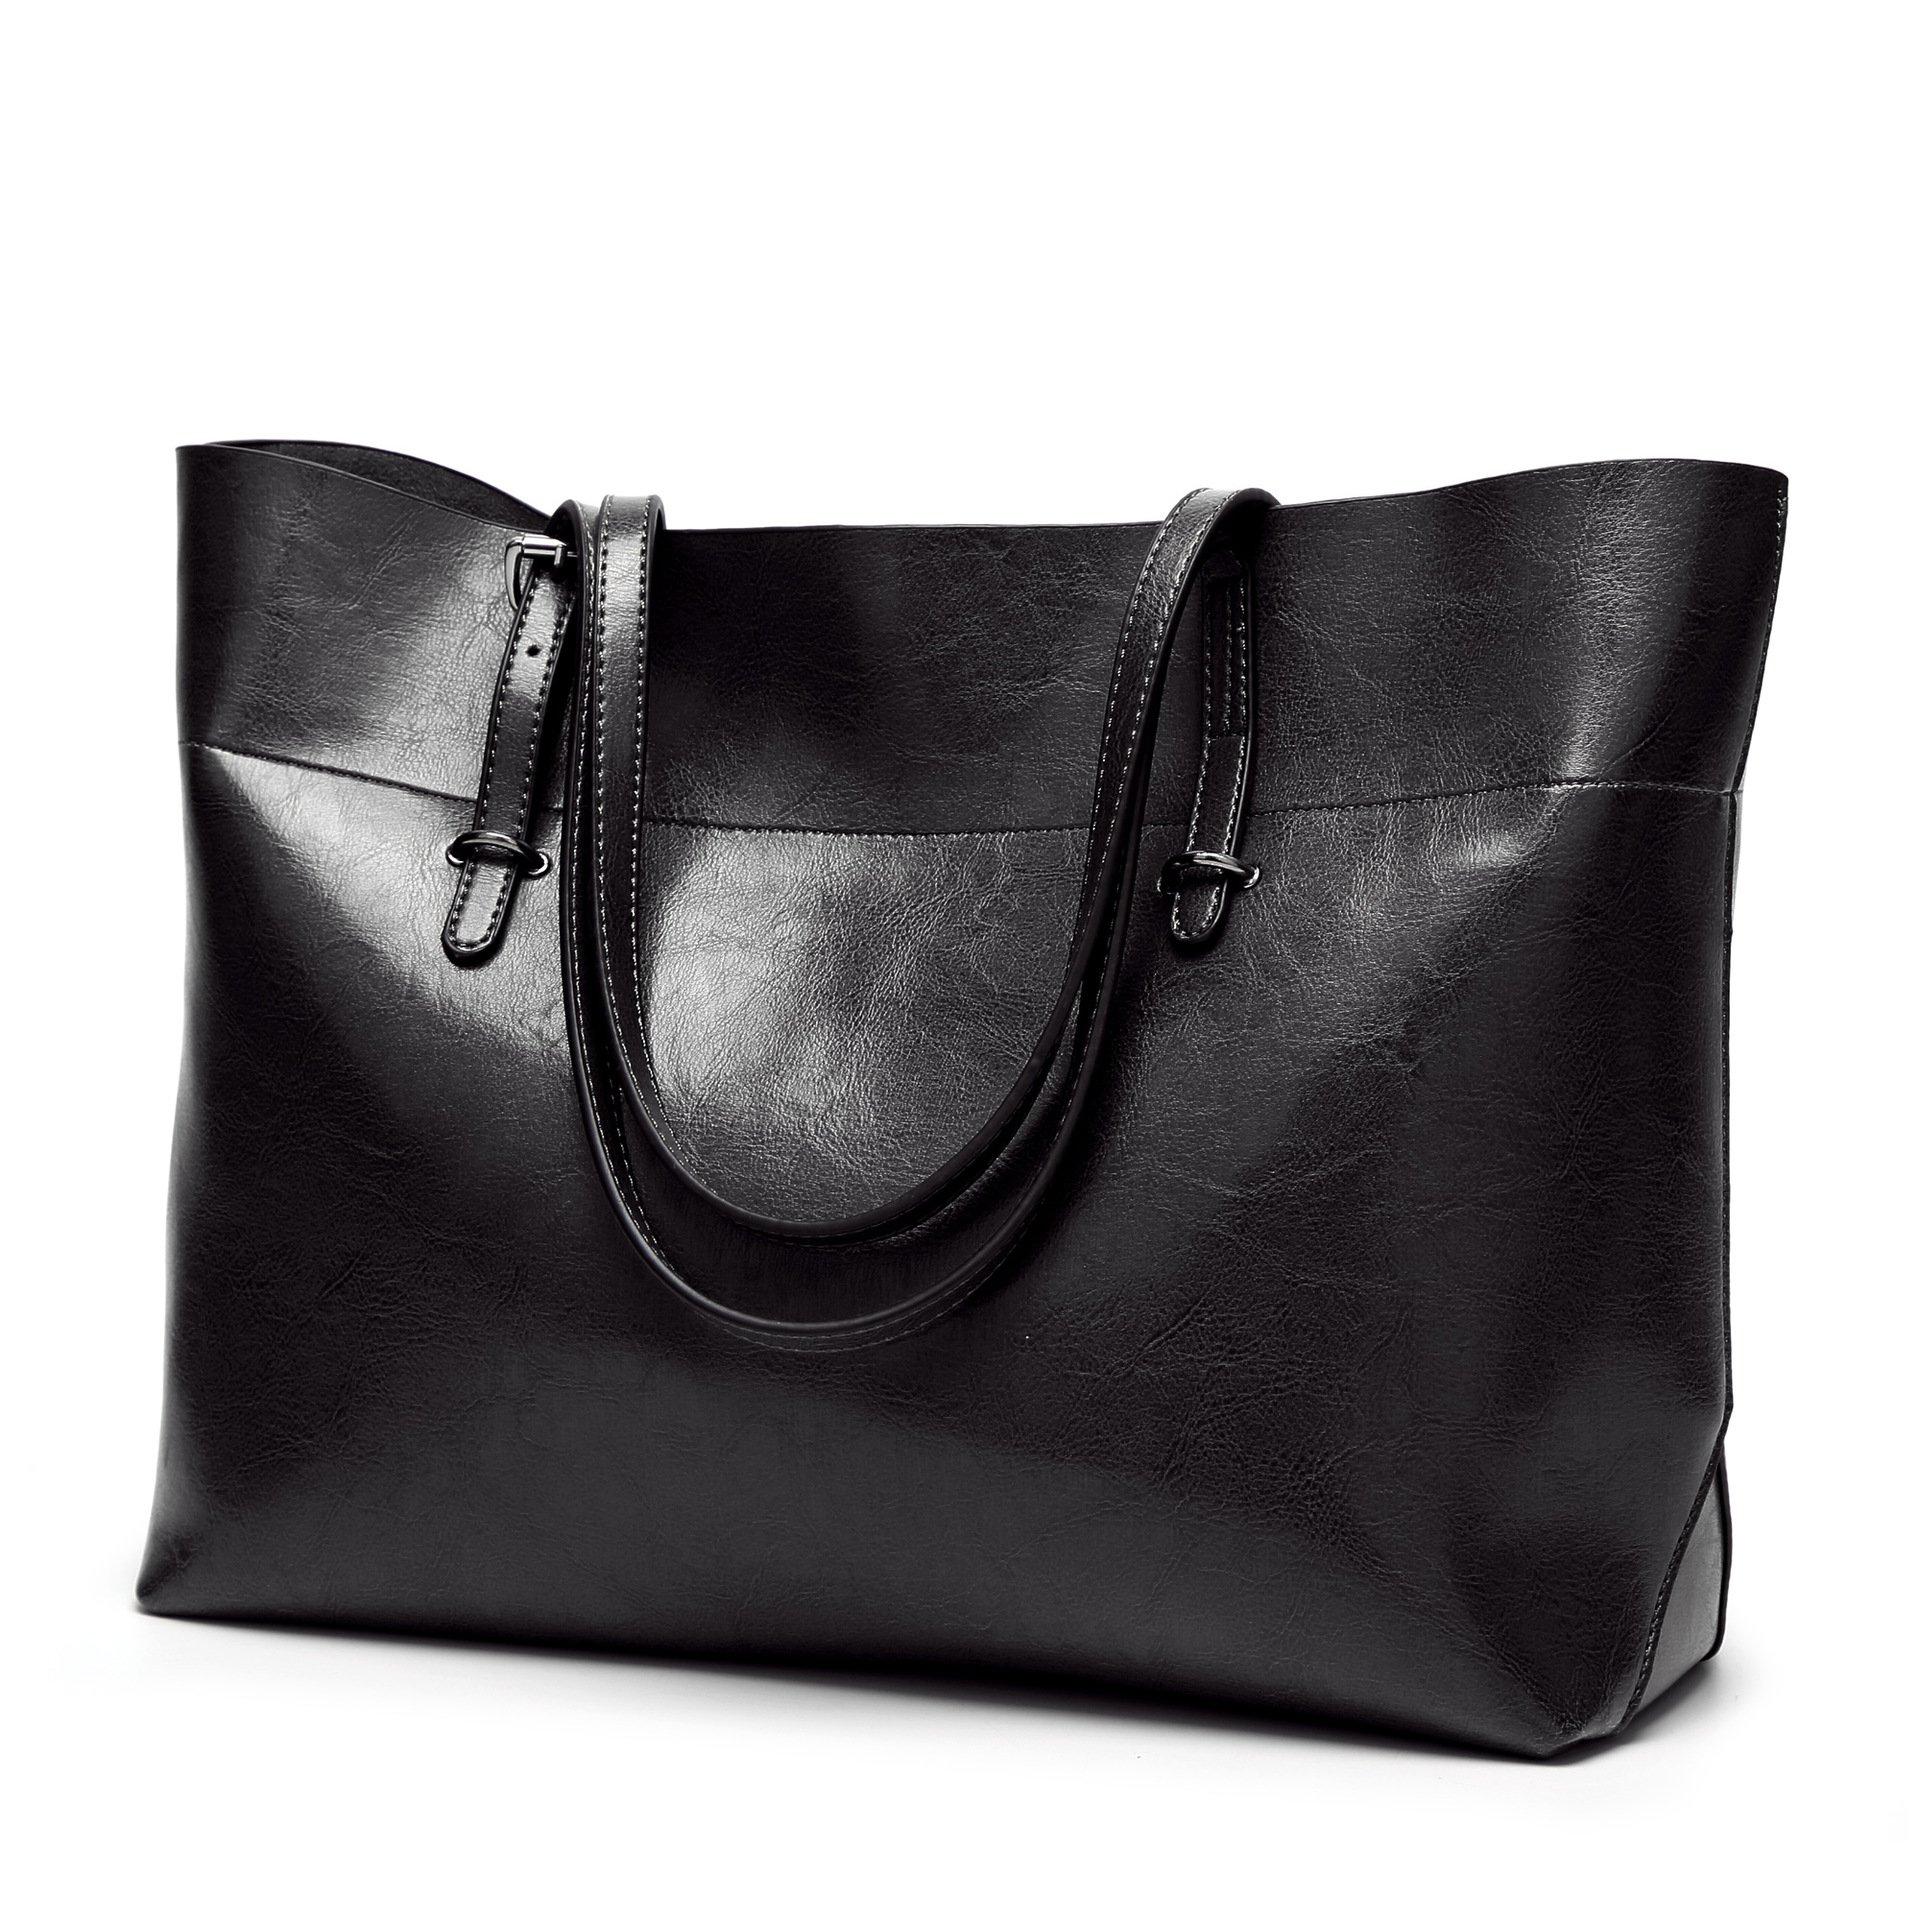 Obosoyo Women Top Handle Satchel Handbags Bag Shoulder Hobo Messenger Bag Tote Purse Black